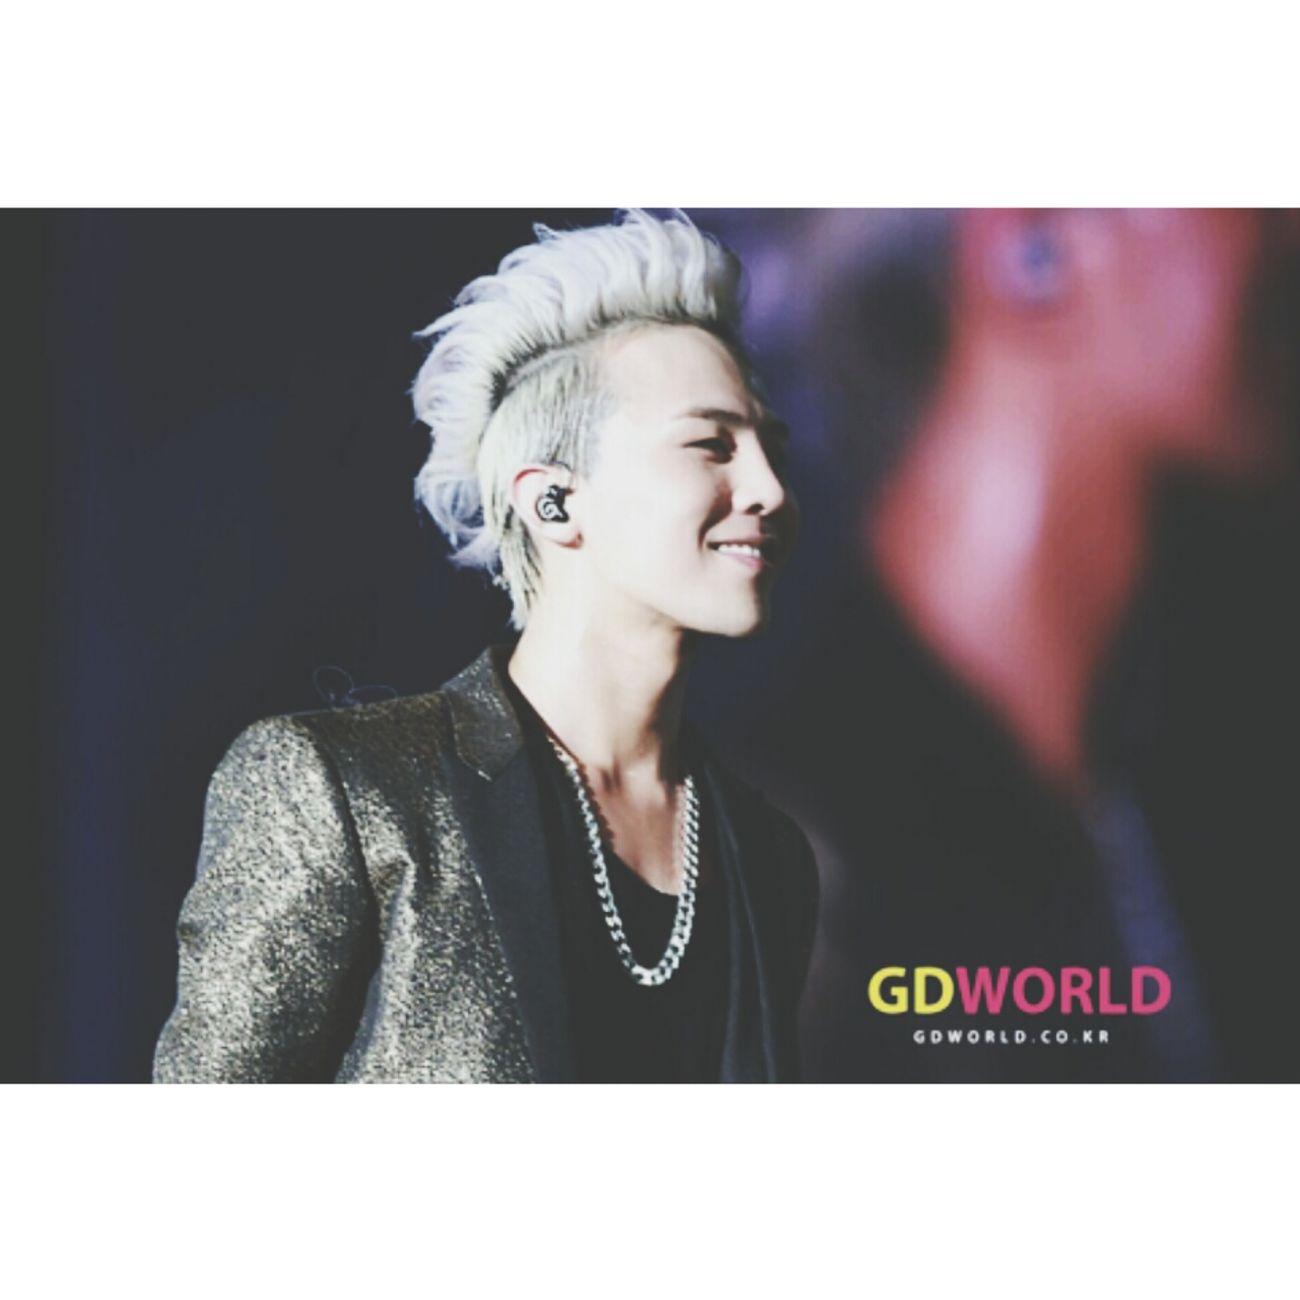 G-dragon GD Jiyong Bigbang